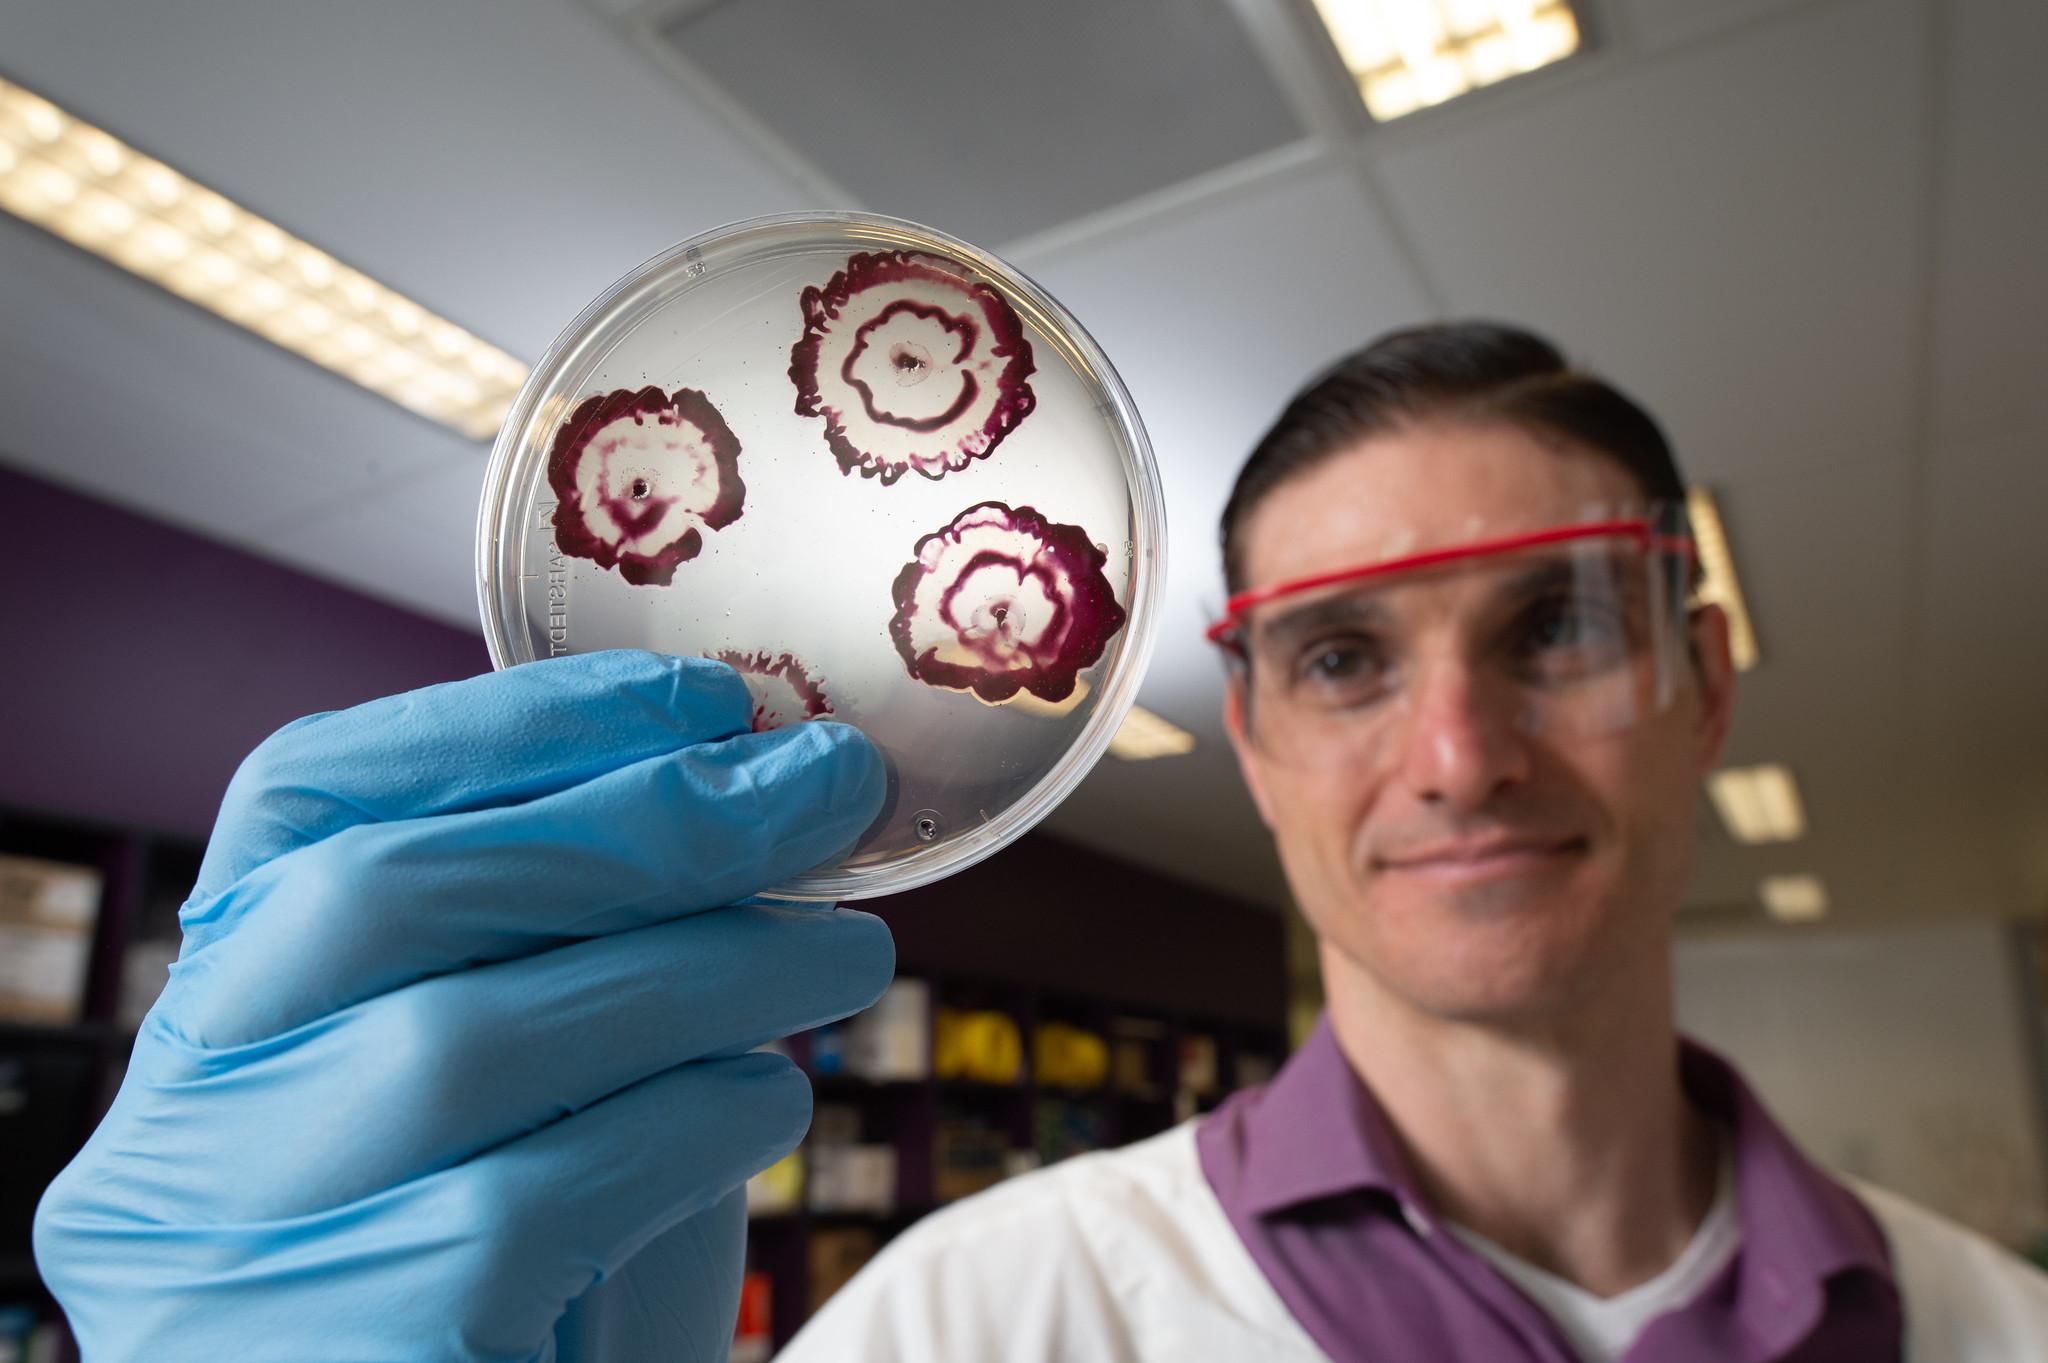 Hybrid antibiotics punch through bacterial biofilms